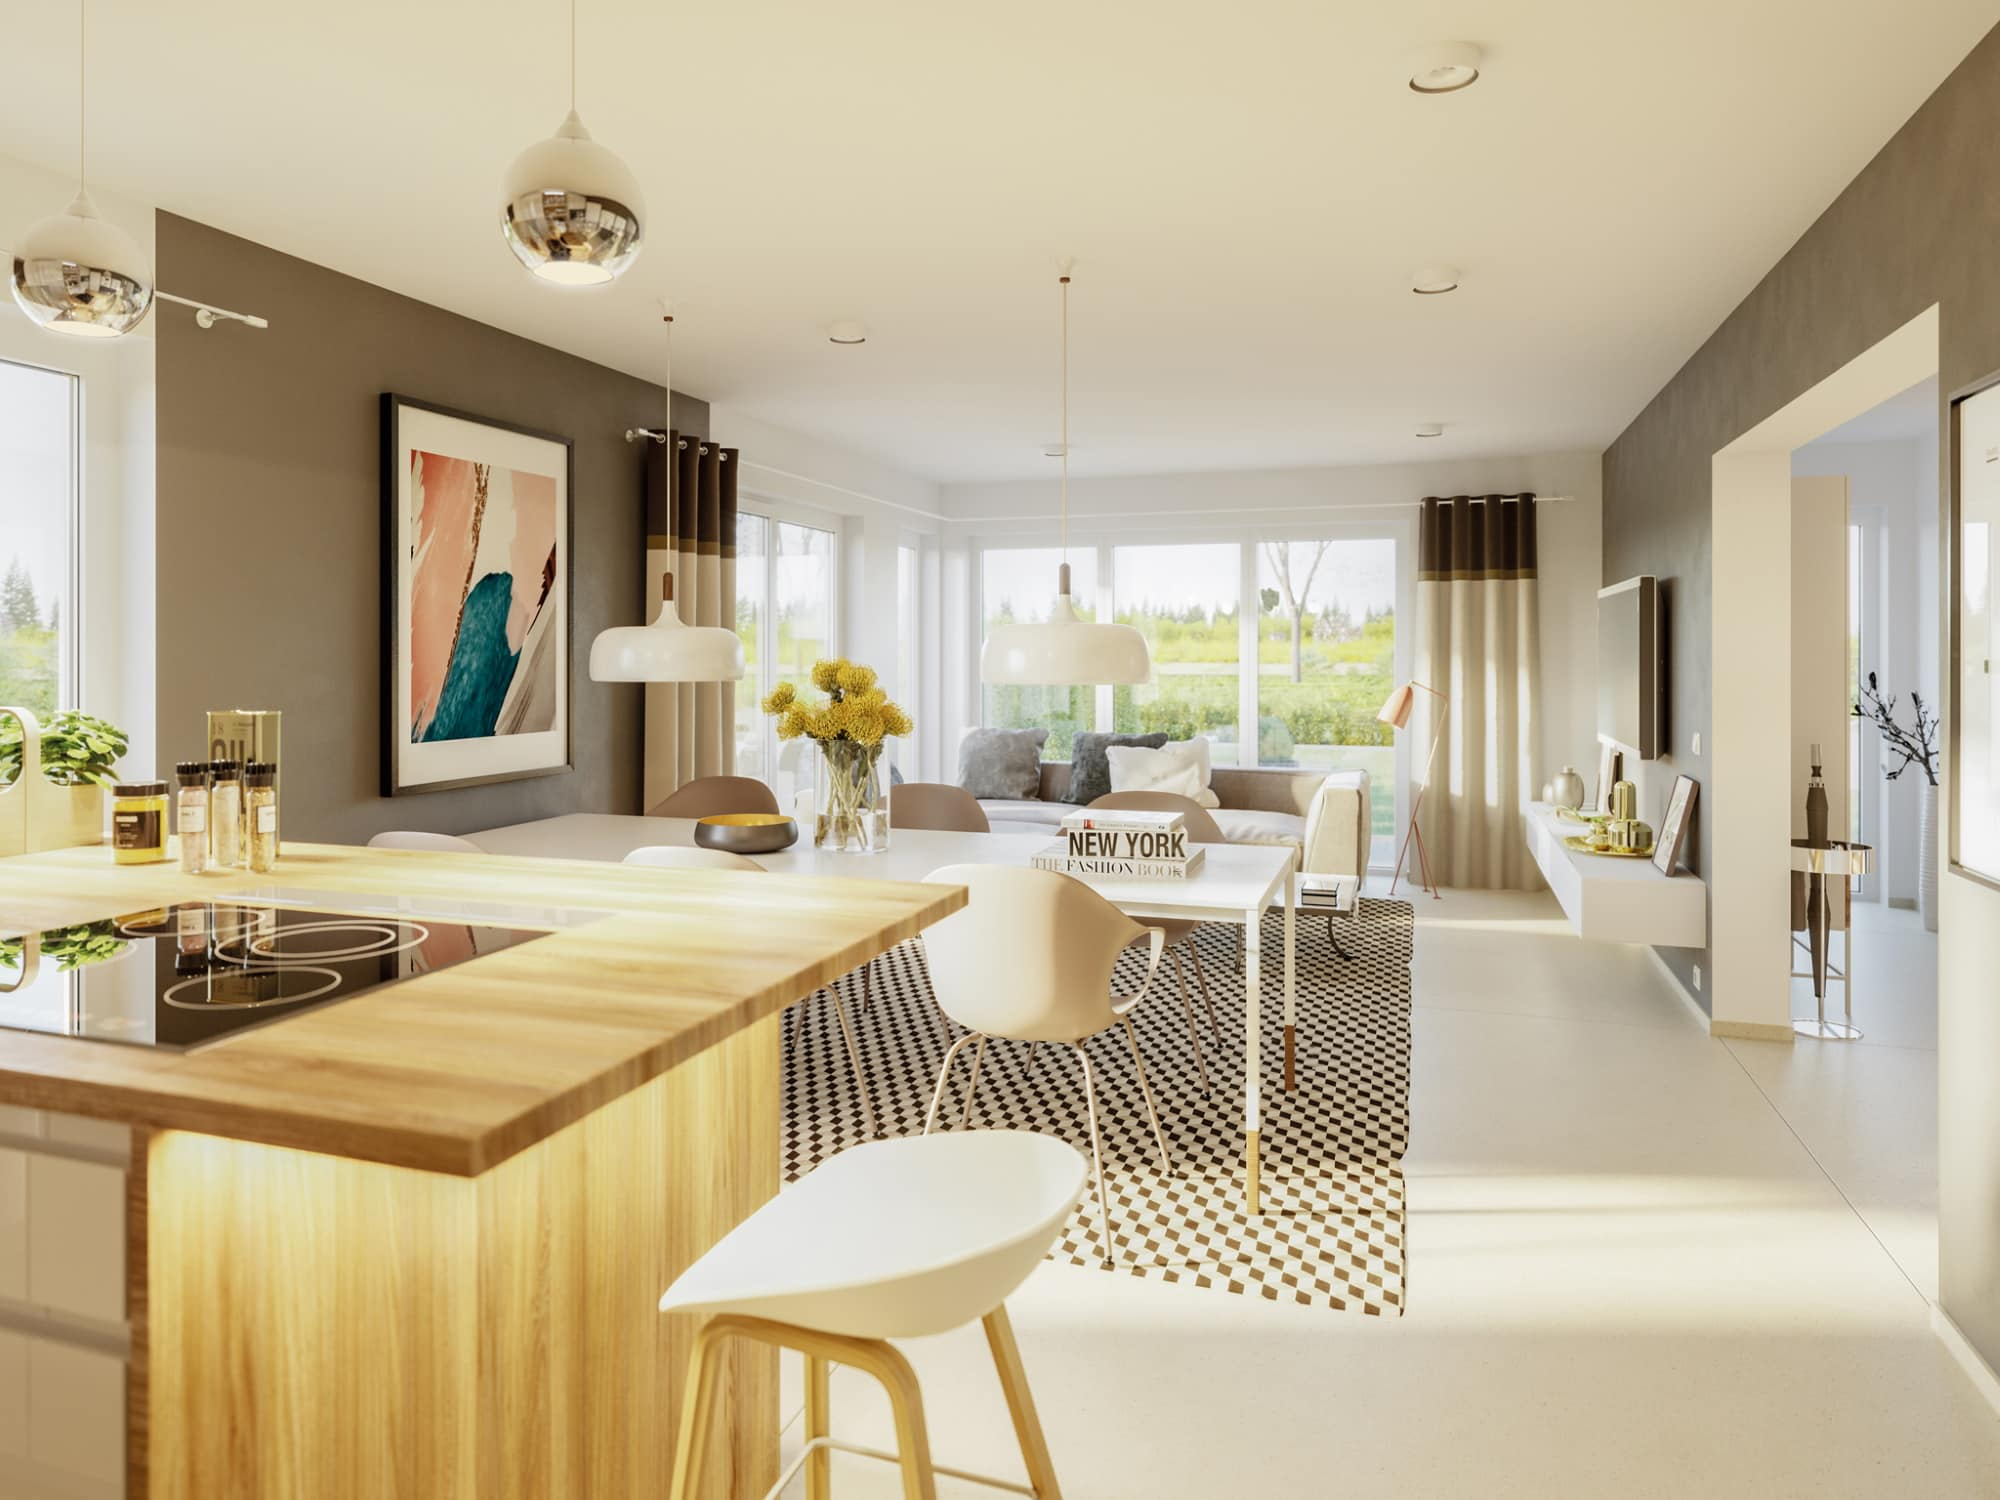 Offenes Wohn-Esszimmer Ideen Inneneinrichtung - Haus Design innen Bien Zenker EDITION 125 V3 - HausbauDirekt.de